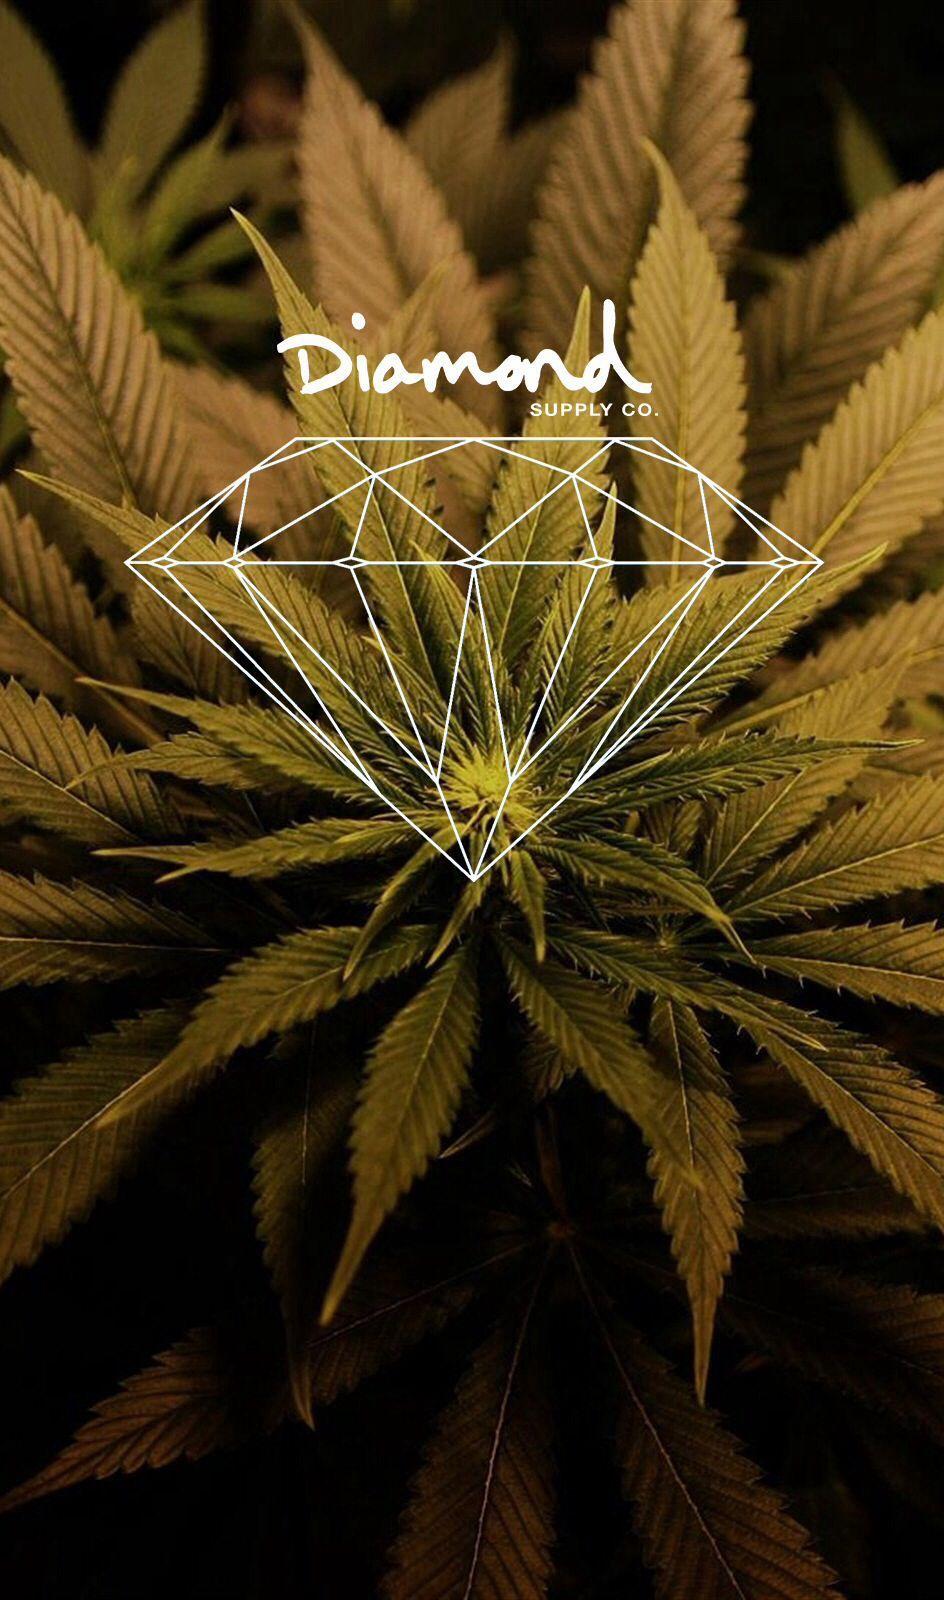 wallpapers iphone 5 diamond weed wallpaper iphone 5